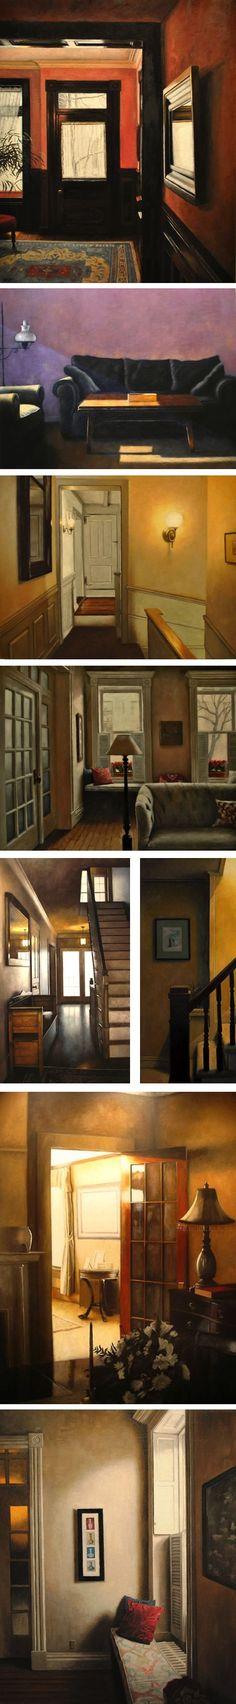 Nick Patten - notice how Edward Hopper managed to instil life in his lonley rooms, I don't think Patten does despite lovely artwork